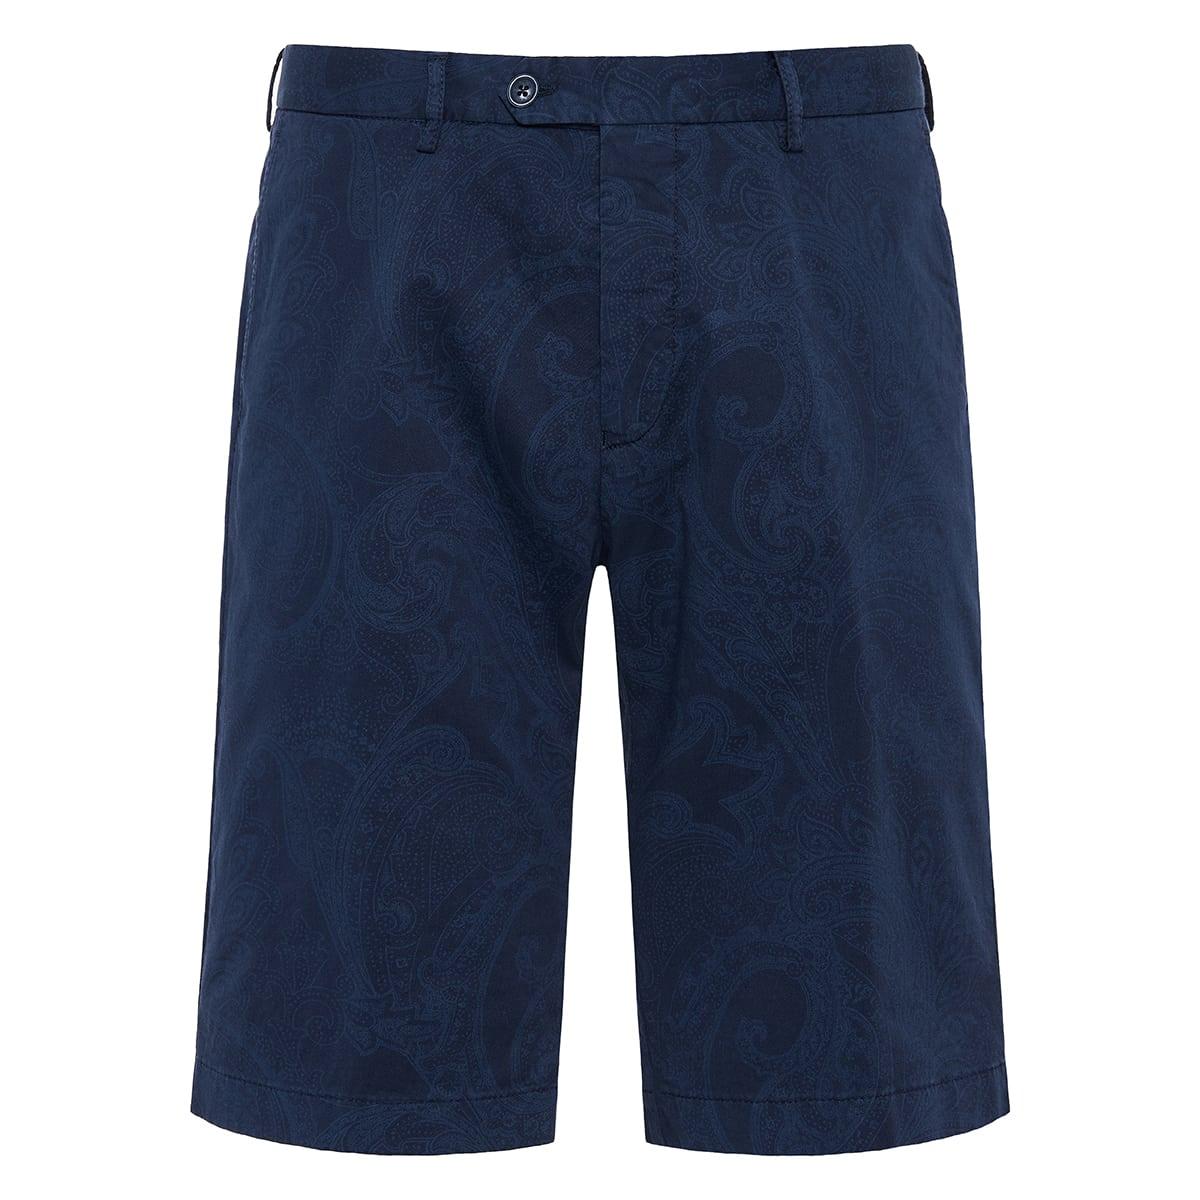 Paisley tailored shorts